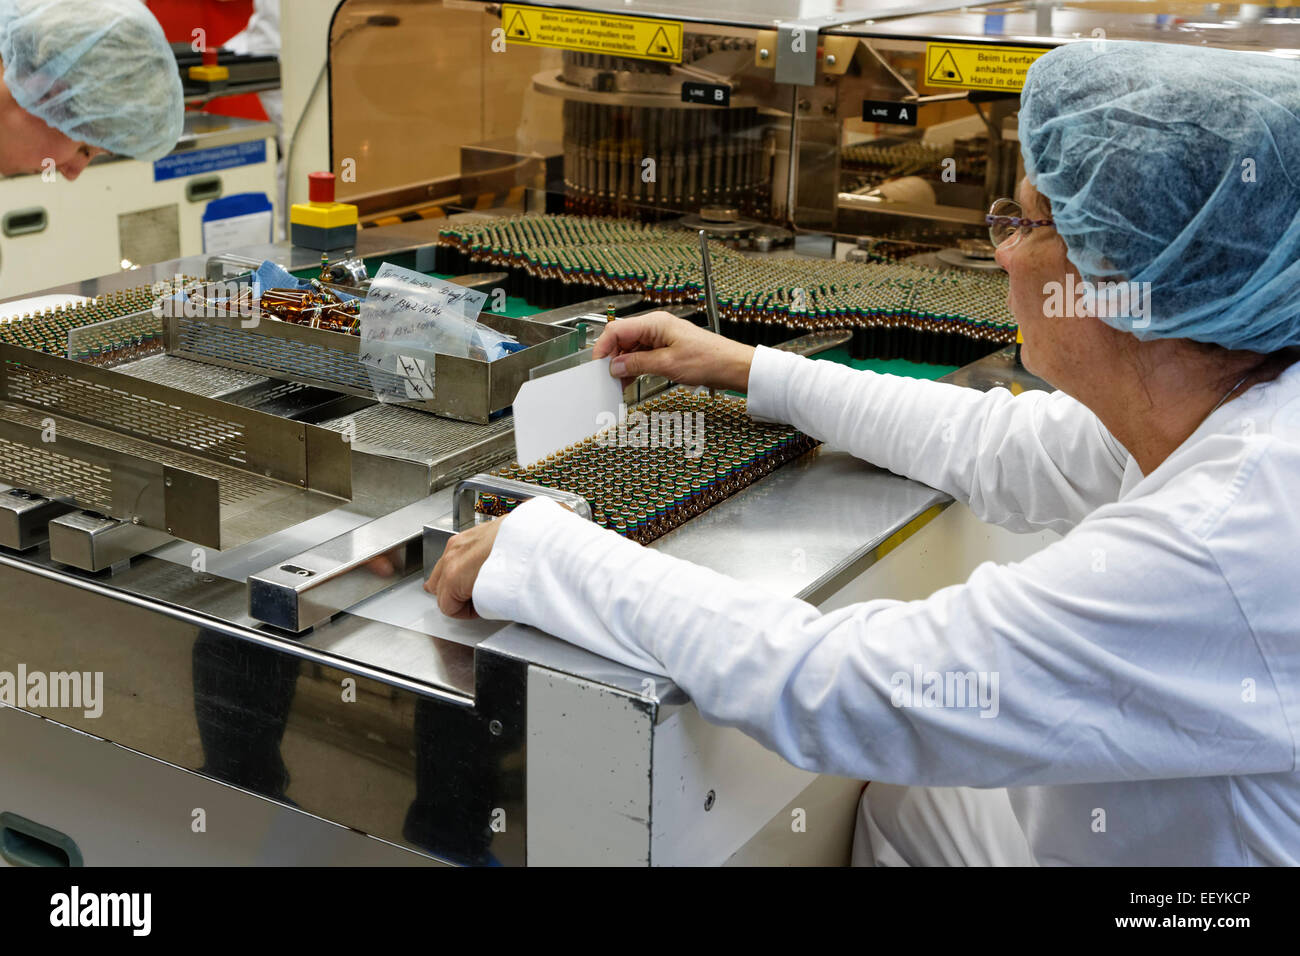 B Braun Melsungen AG Pharma Berlin Stock Photo: 78054614 - Alamy